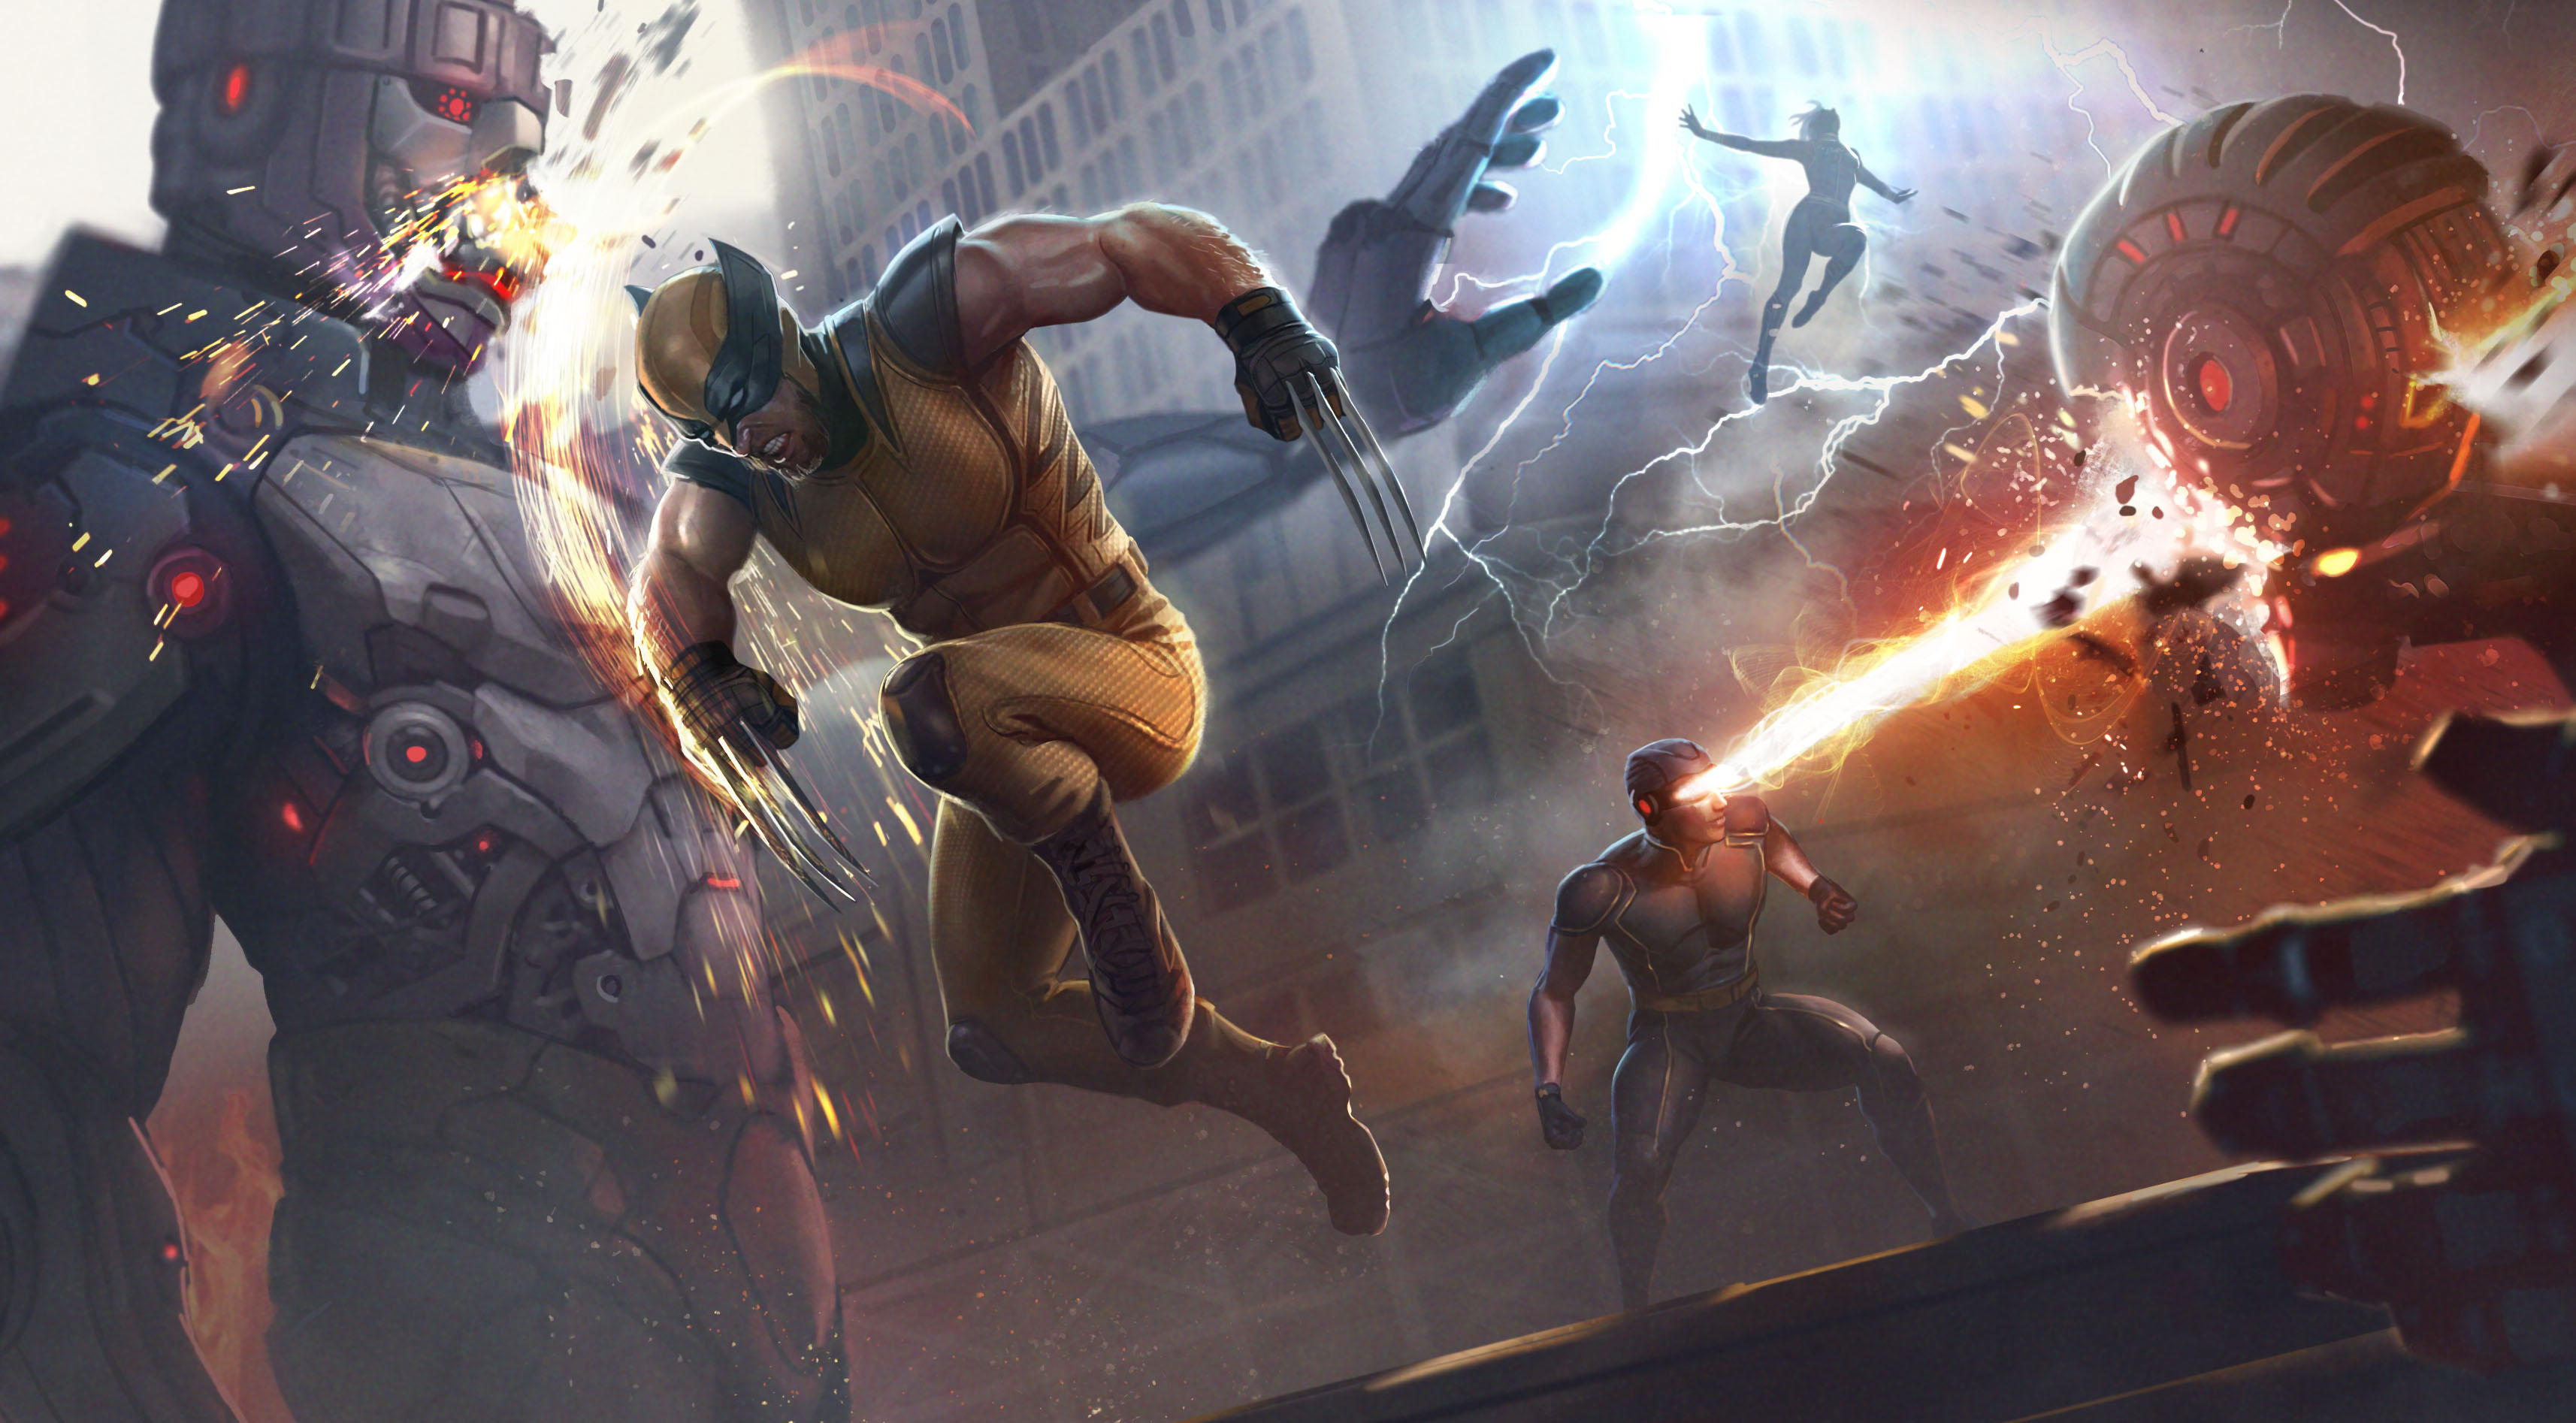 Fondos de pantalla X Men en batalla